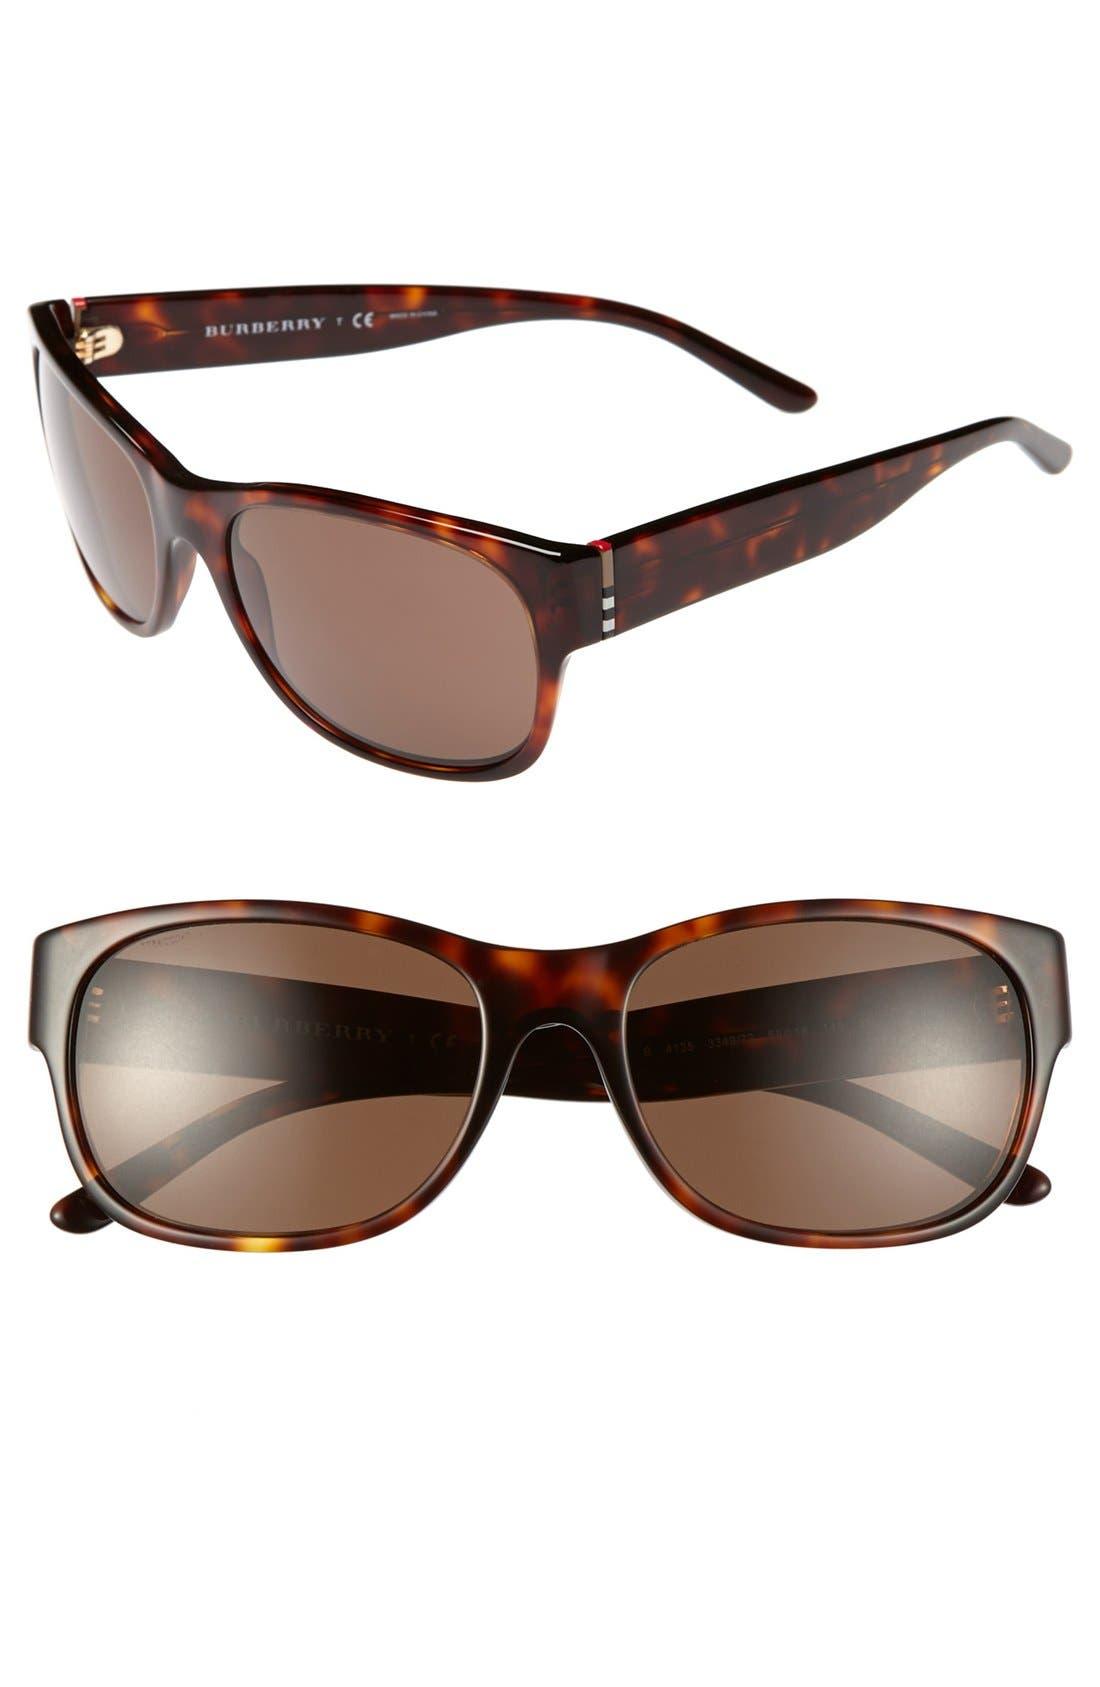 Main Image - Burberry 58mm Sunglasses